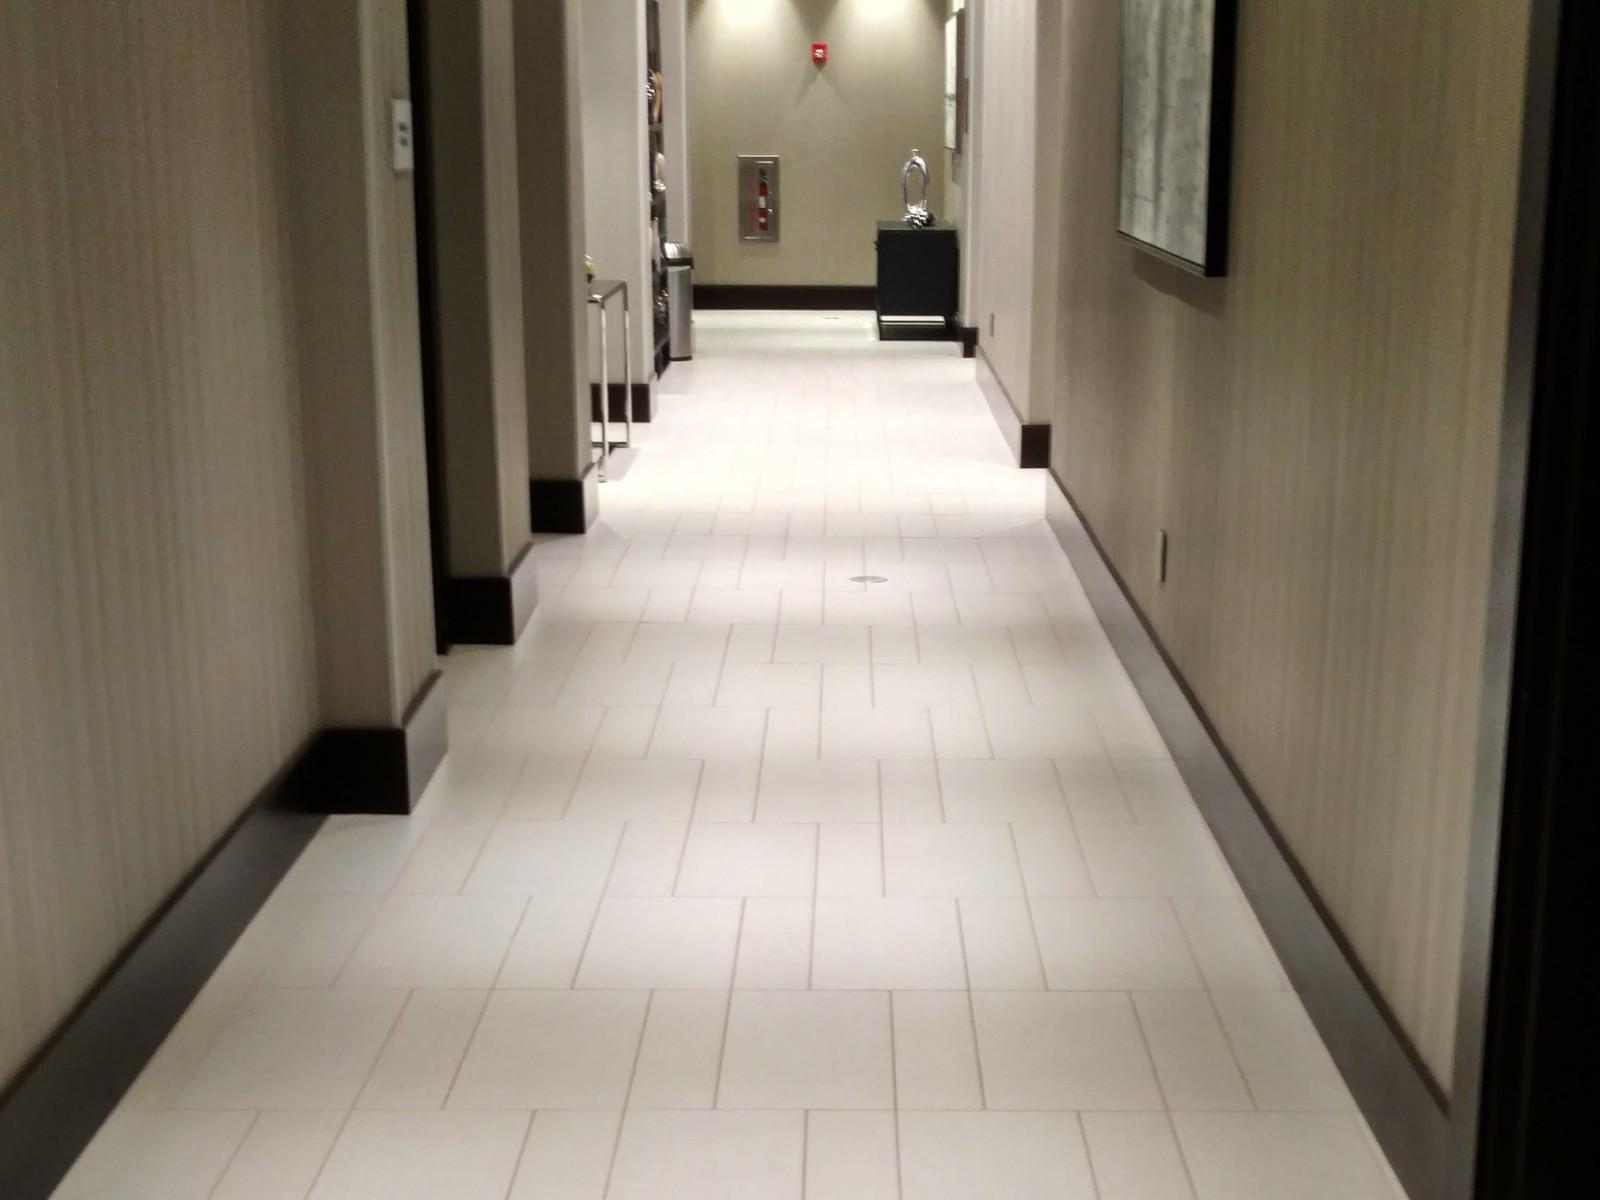 Courtyard by Marriott | Flooring Installation System